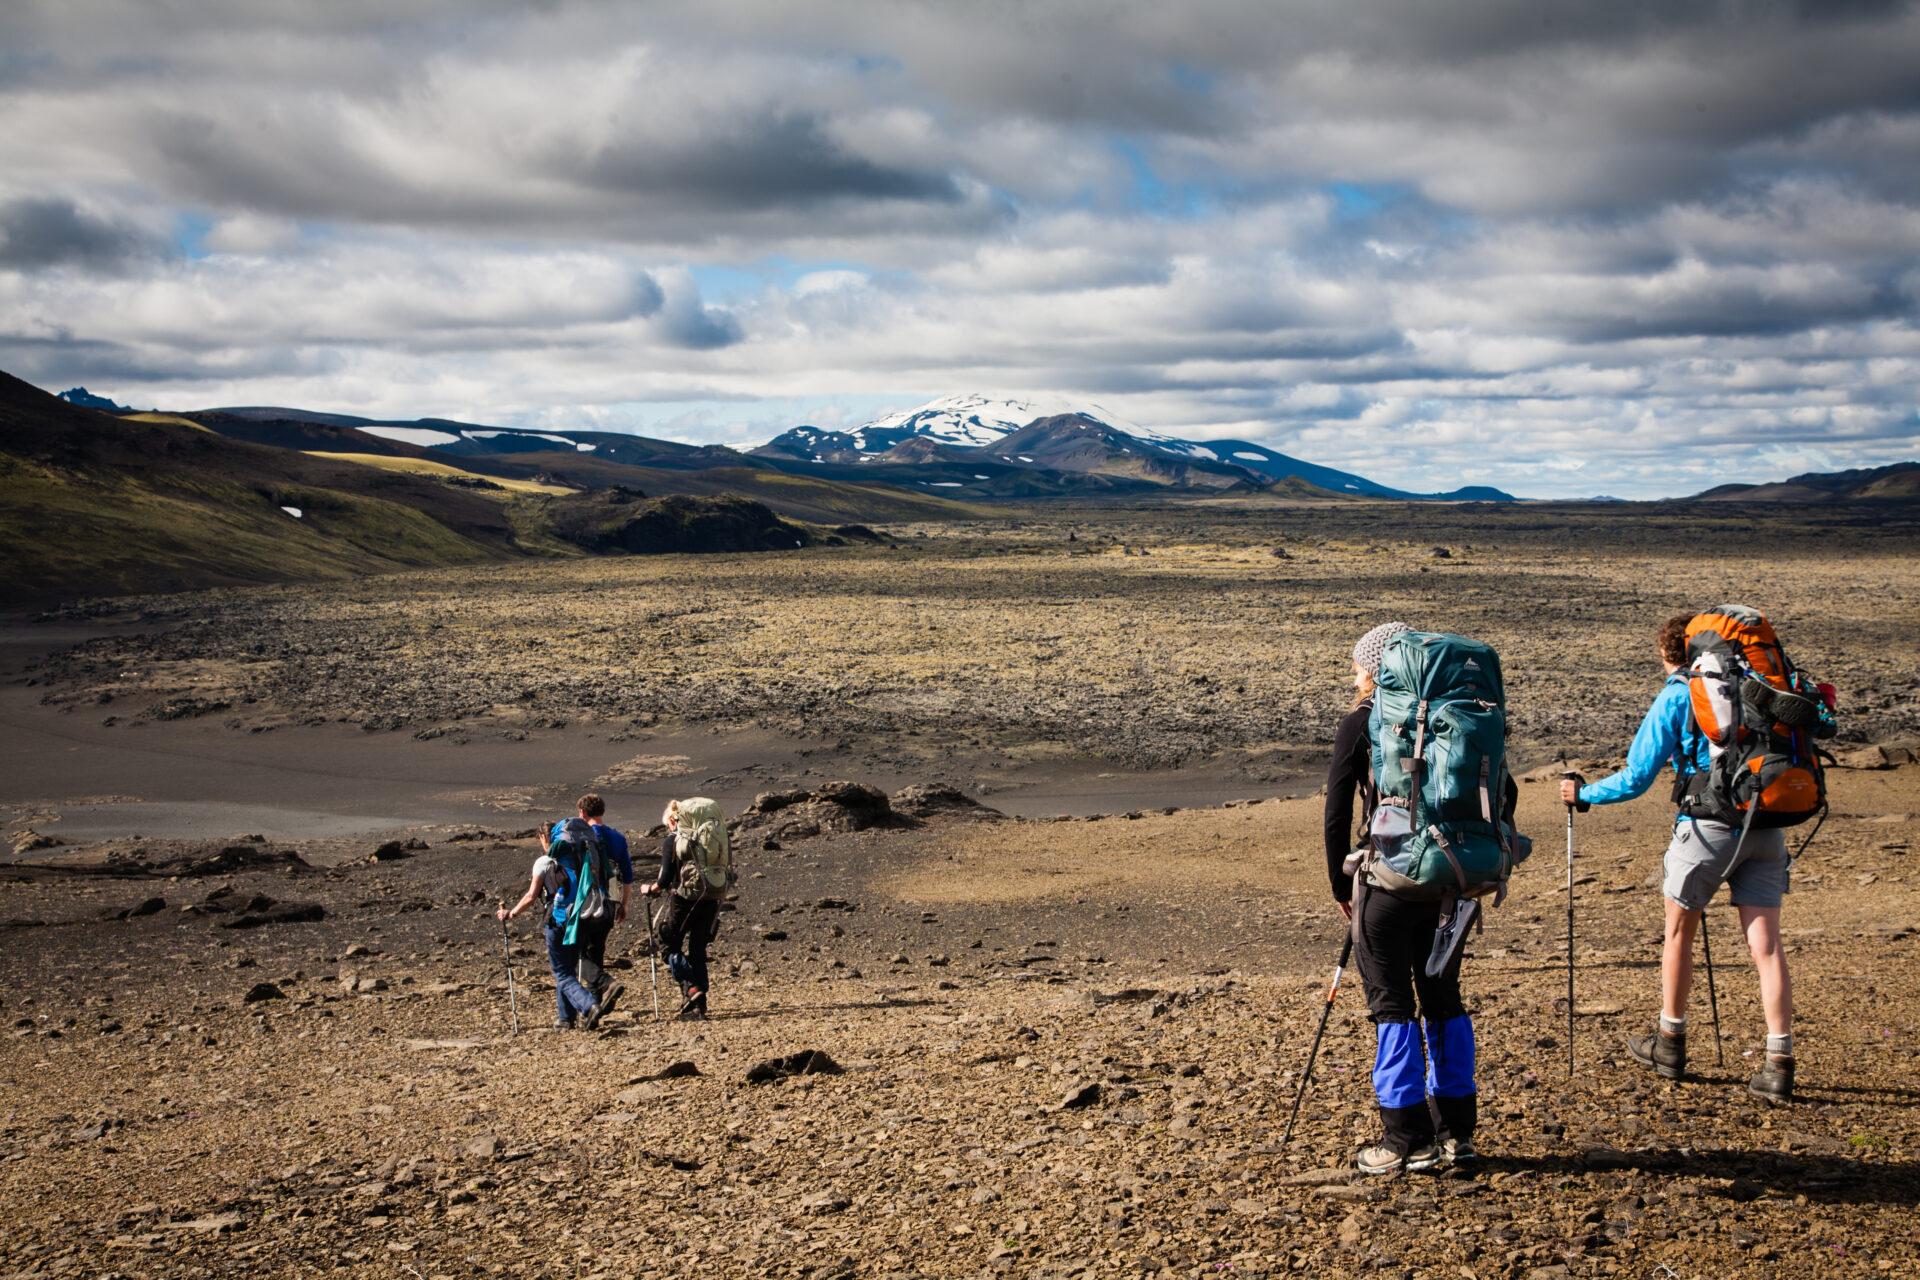 Wildernis trekking